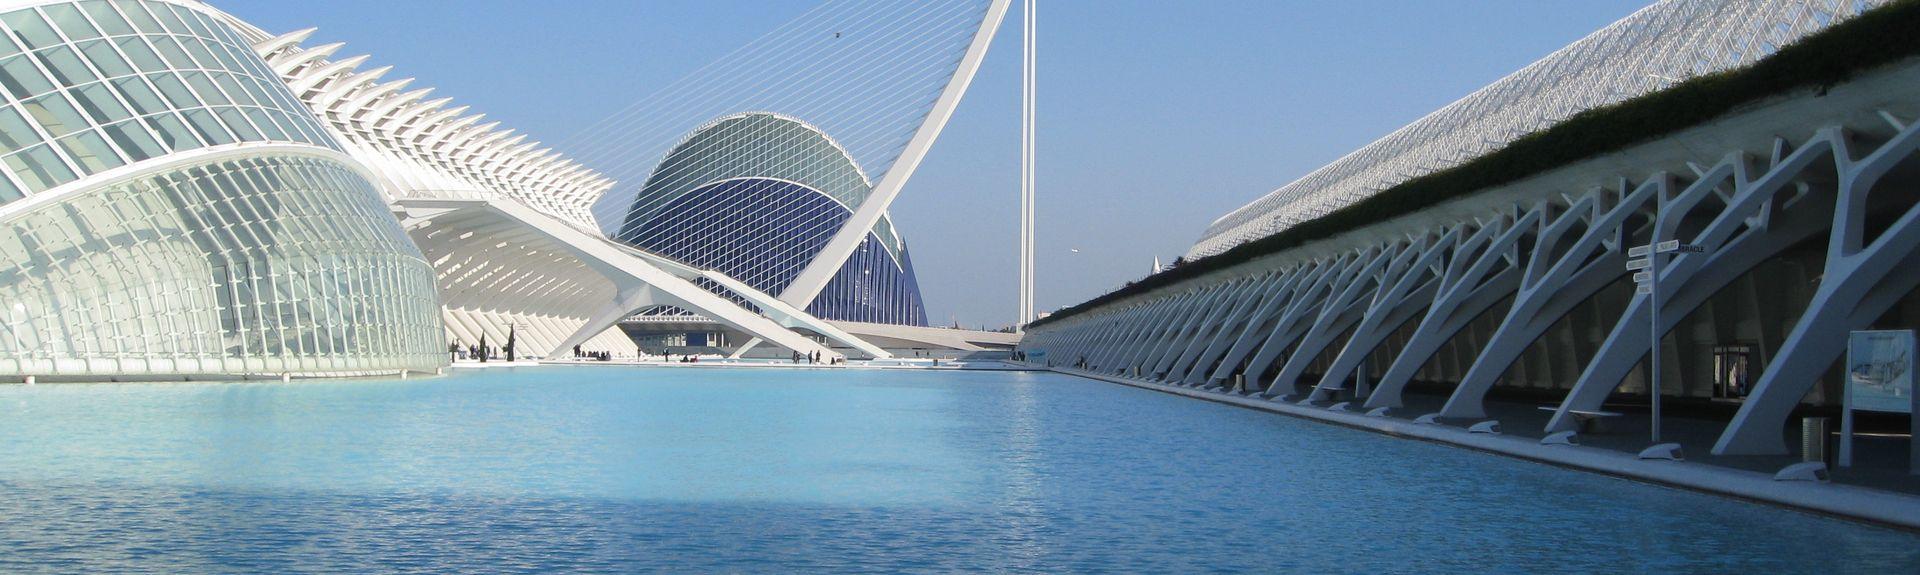 La Seu, València, Valencia, Spain